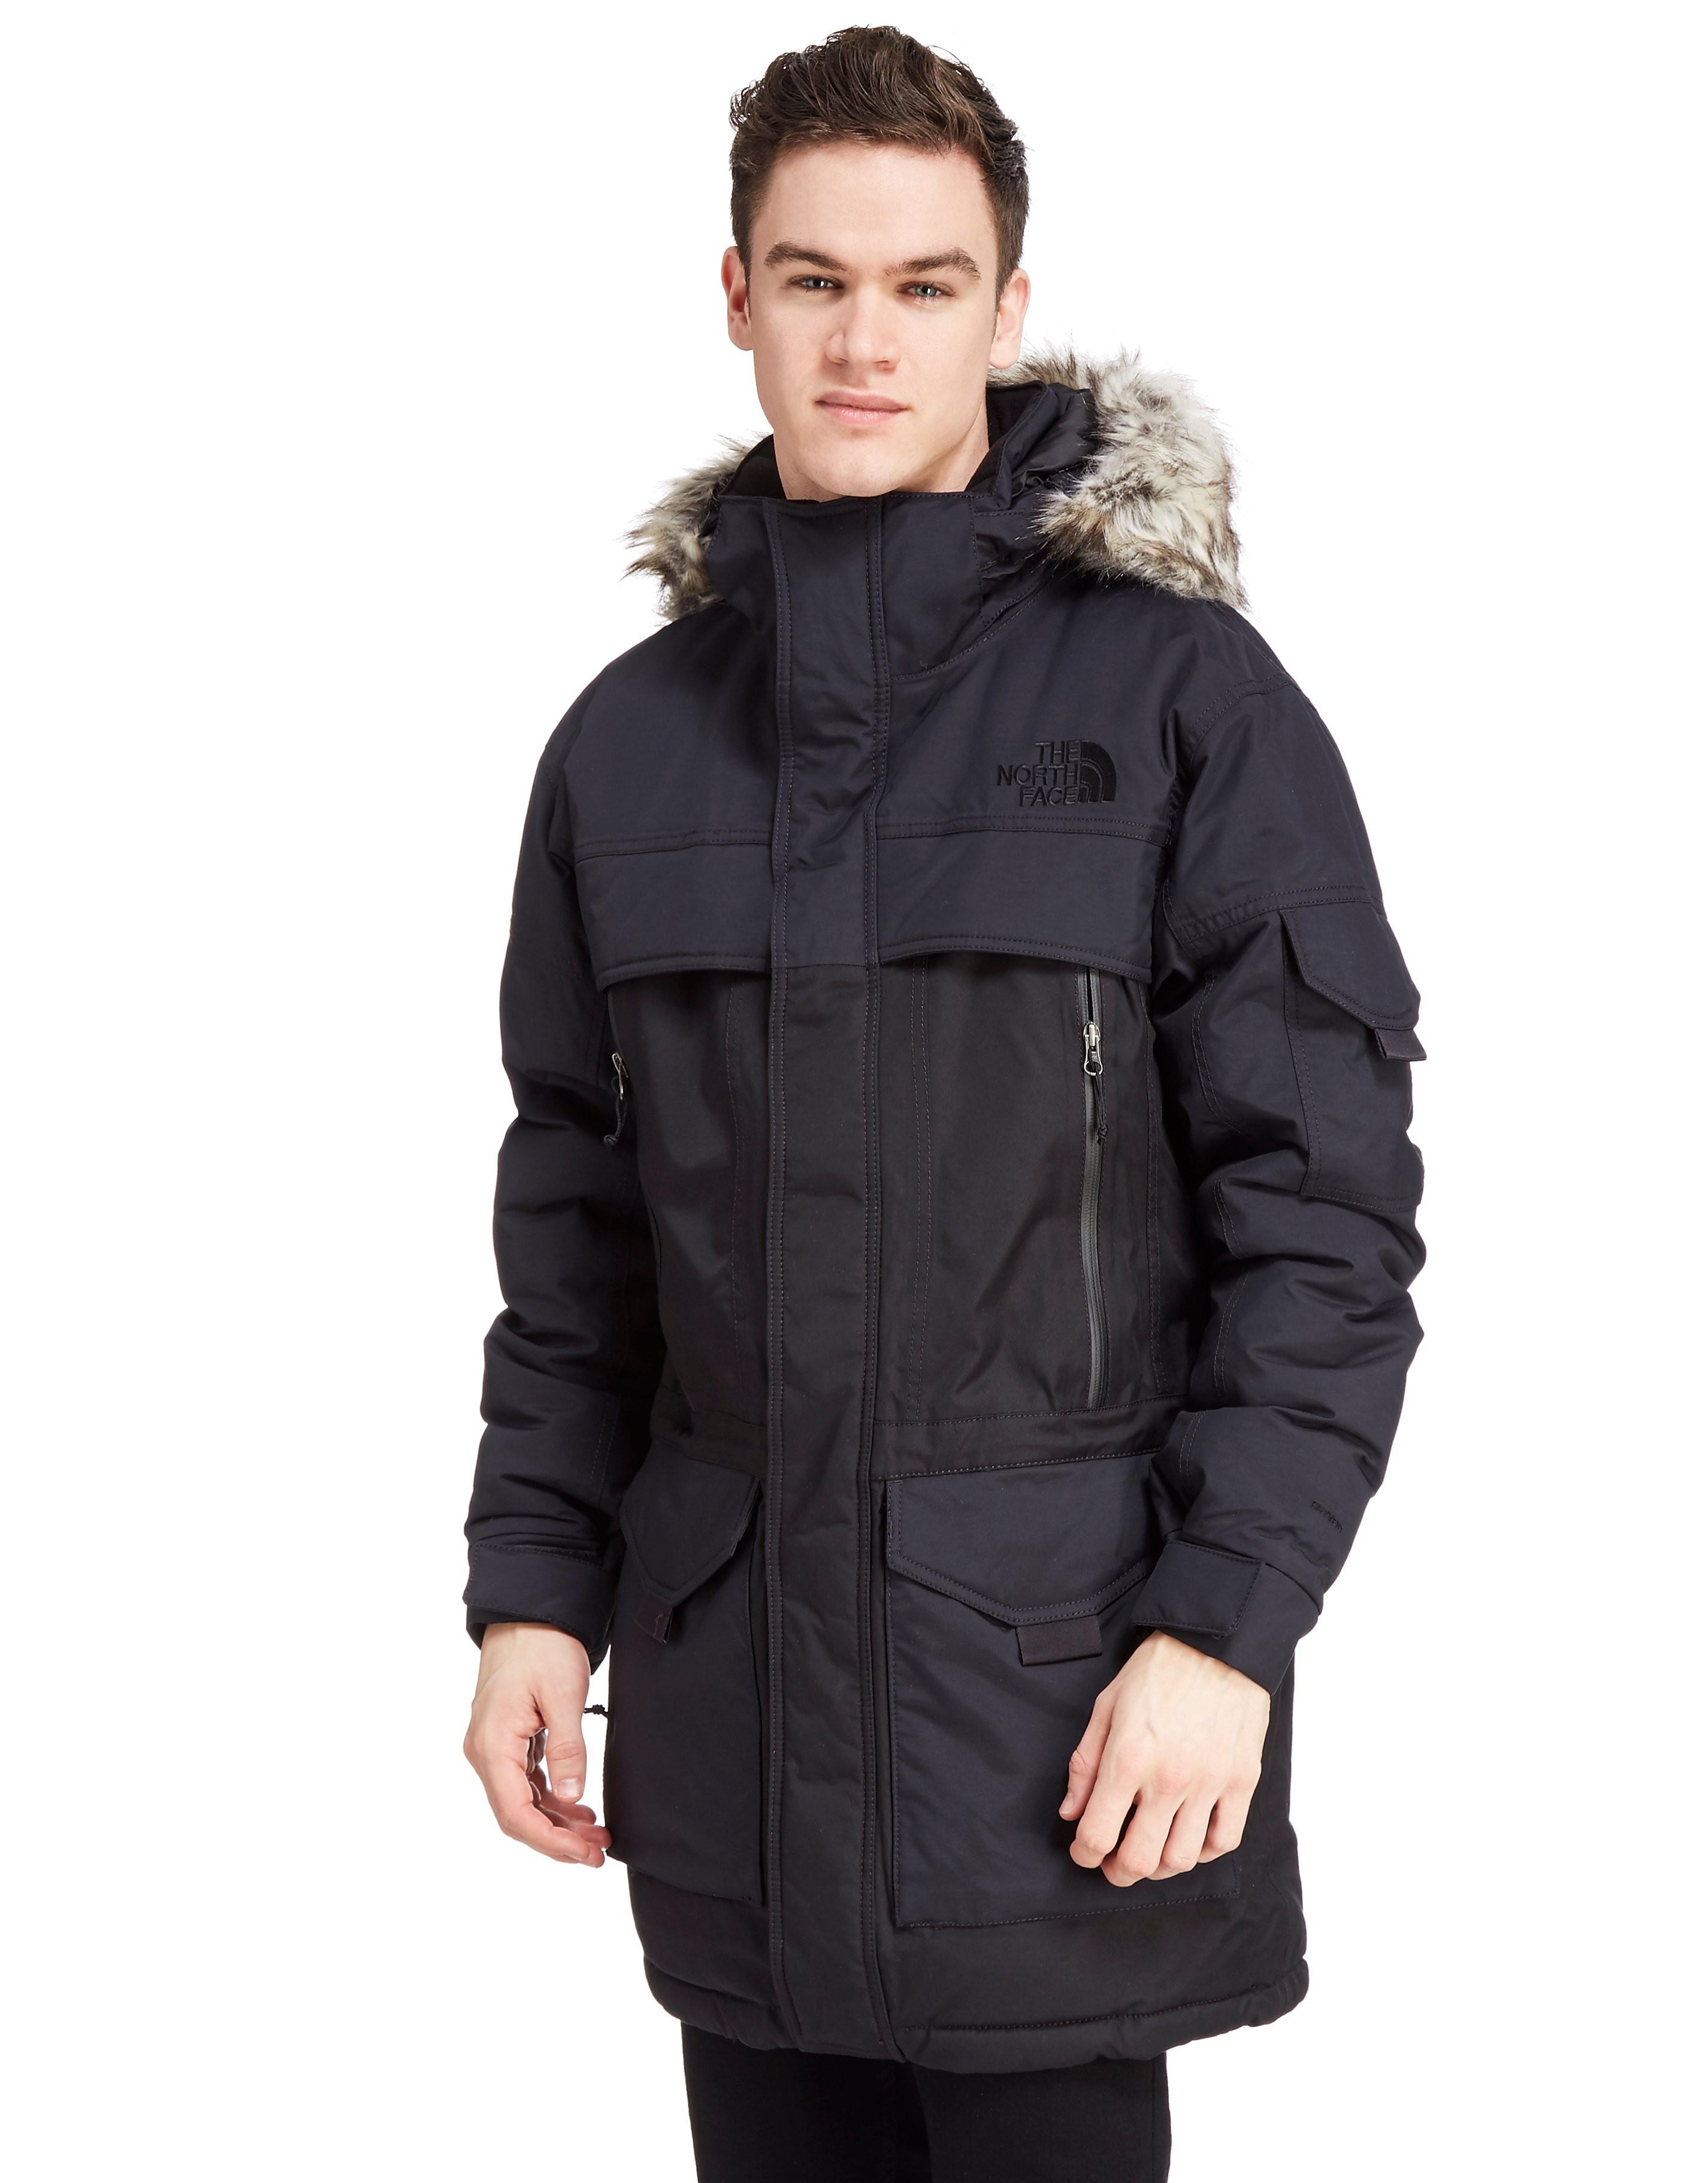 The North Face McMurdo II Parka Jacket